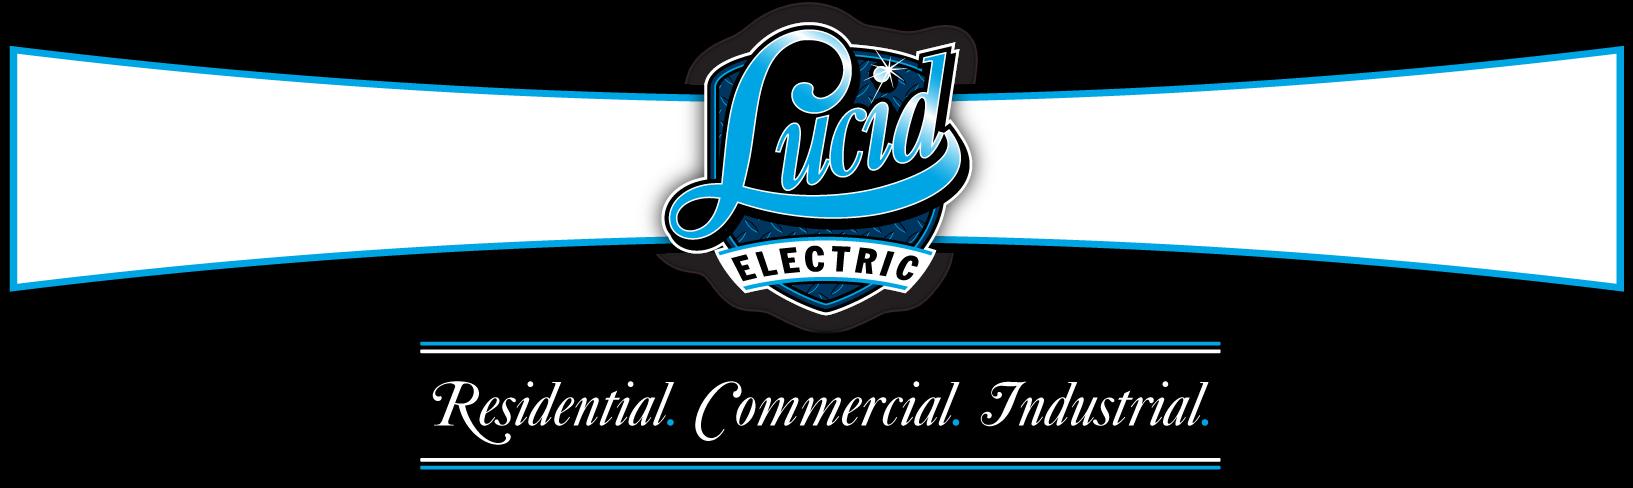 top-logo-banner.png